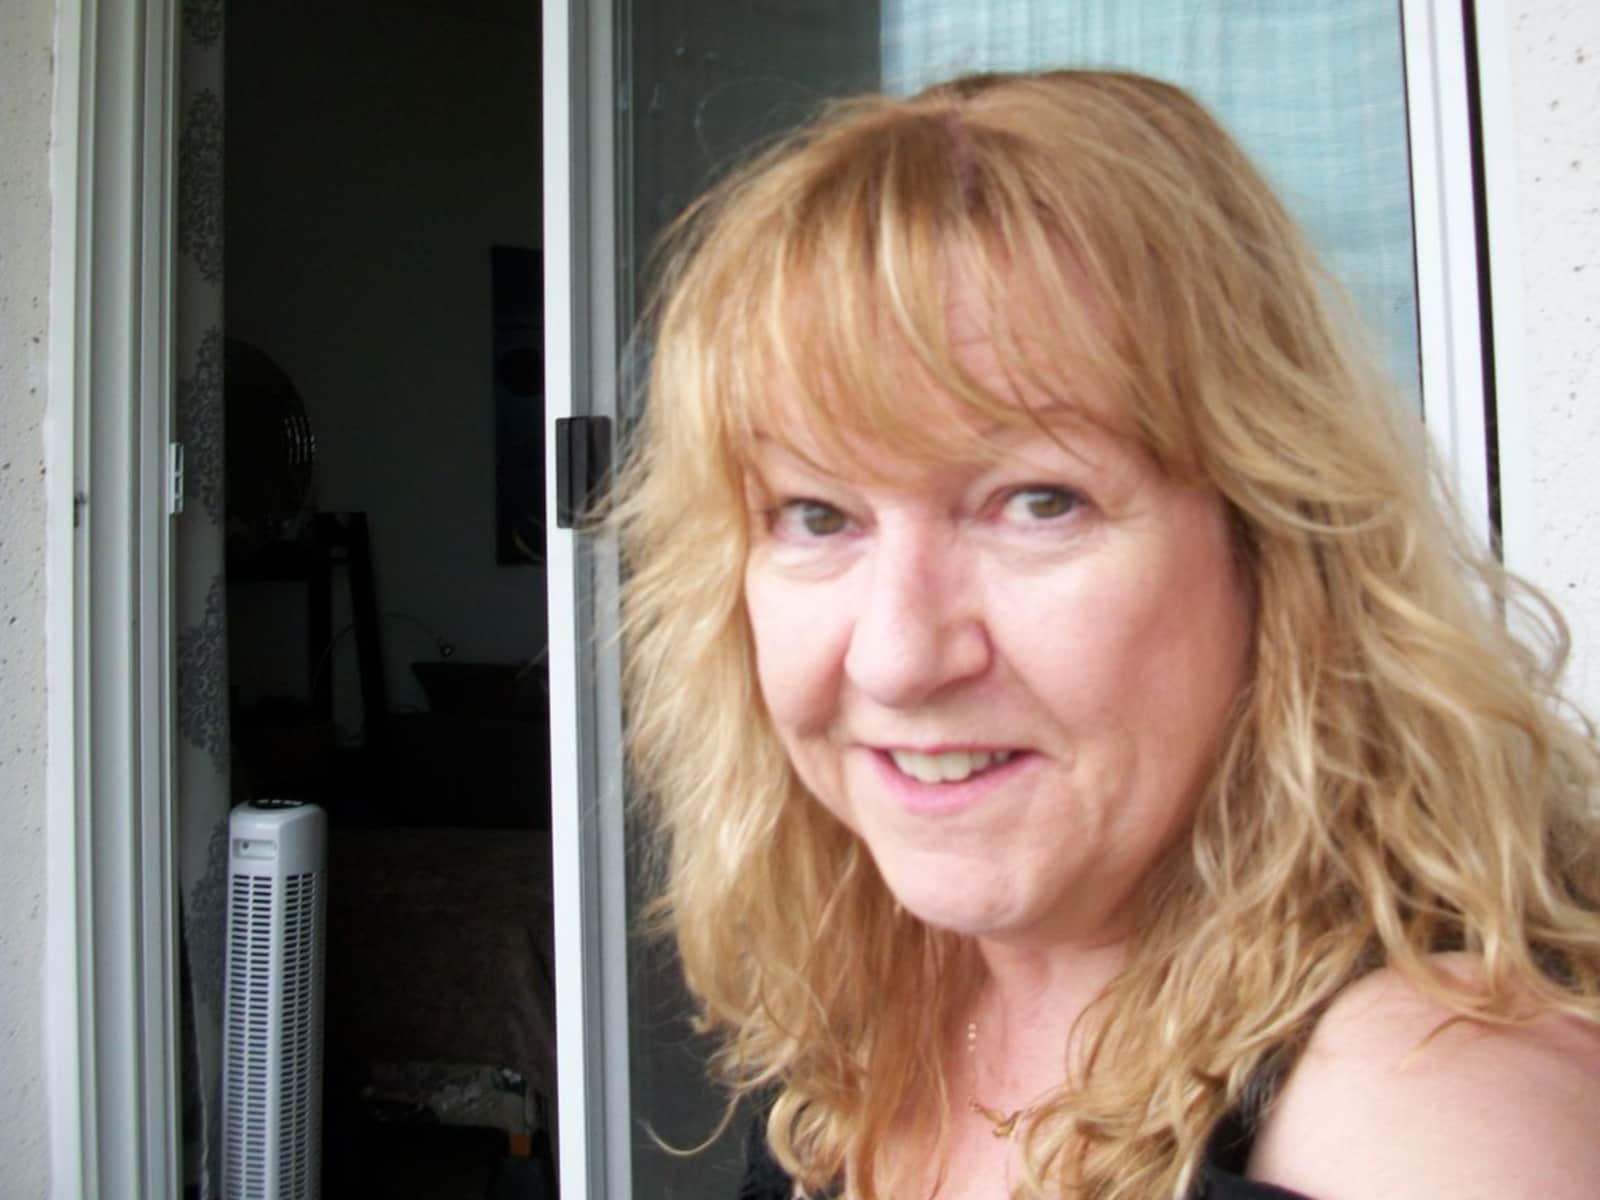 Karen from Winnipeg, Manitoba, Canada